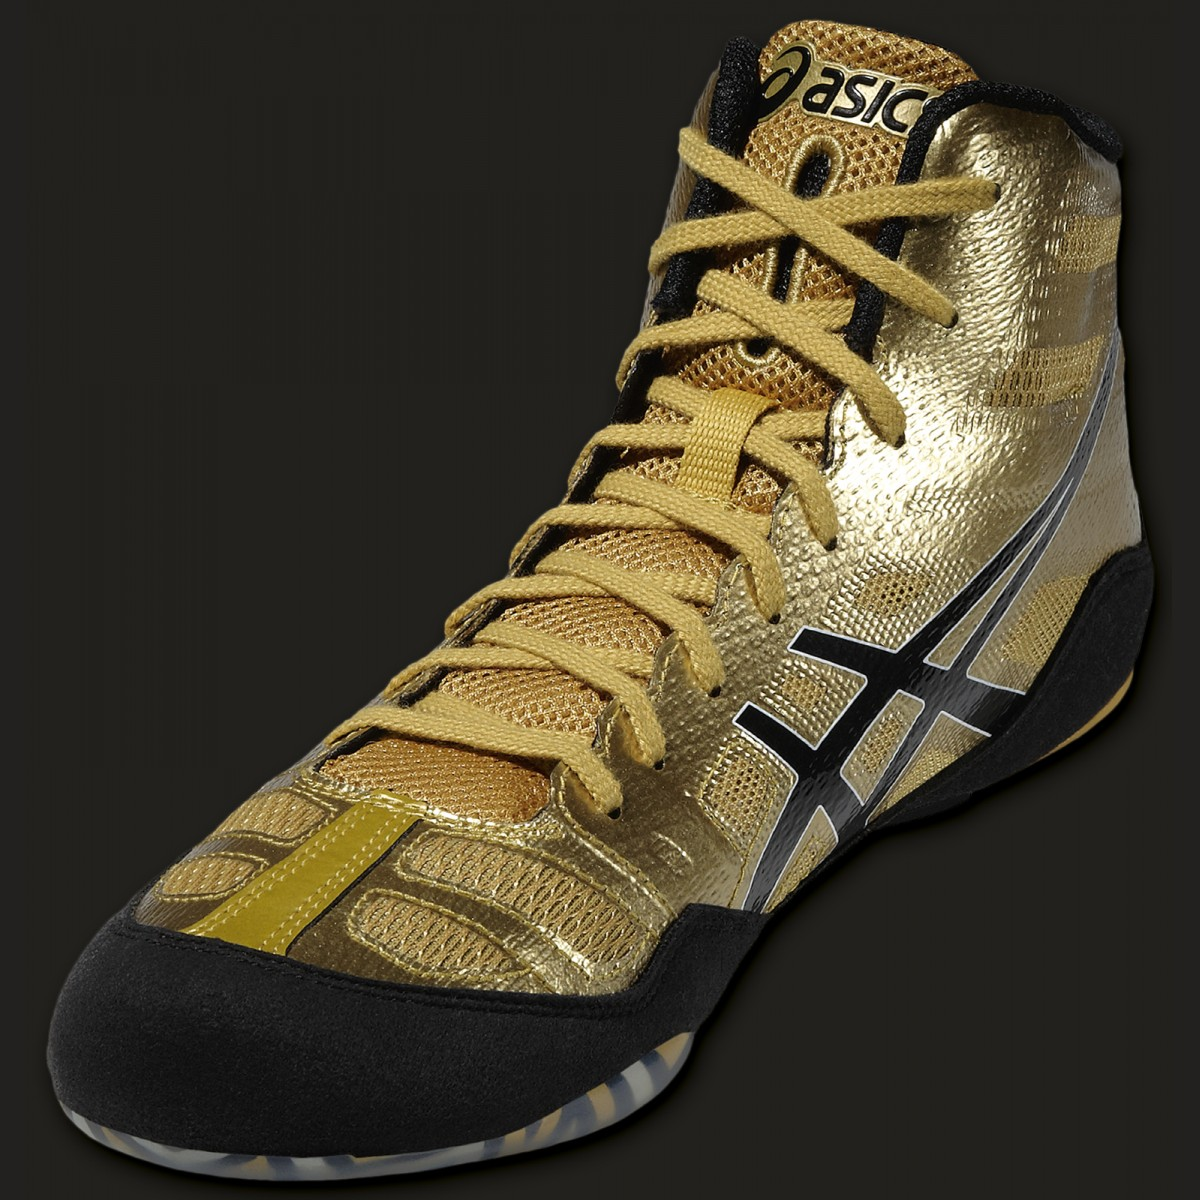 chaussure boxe anglaise asics